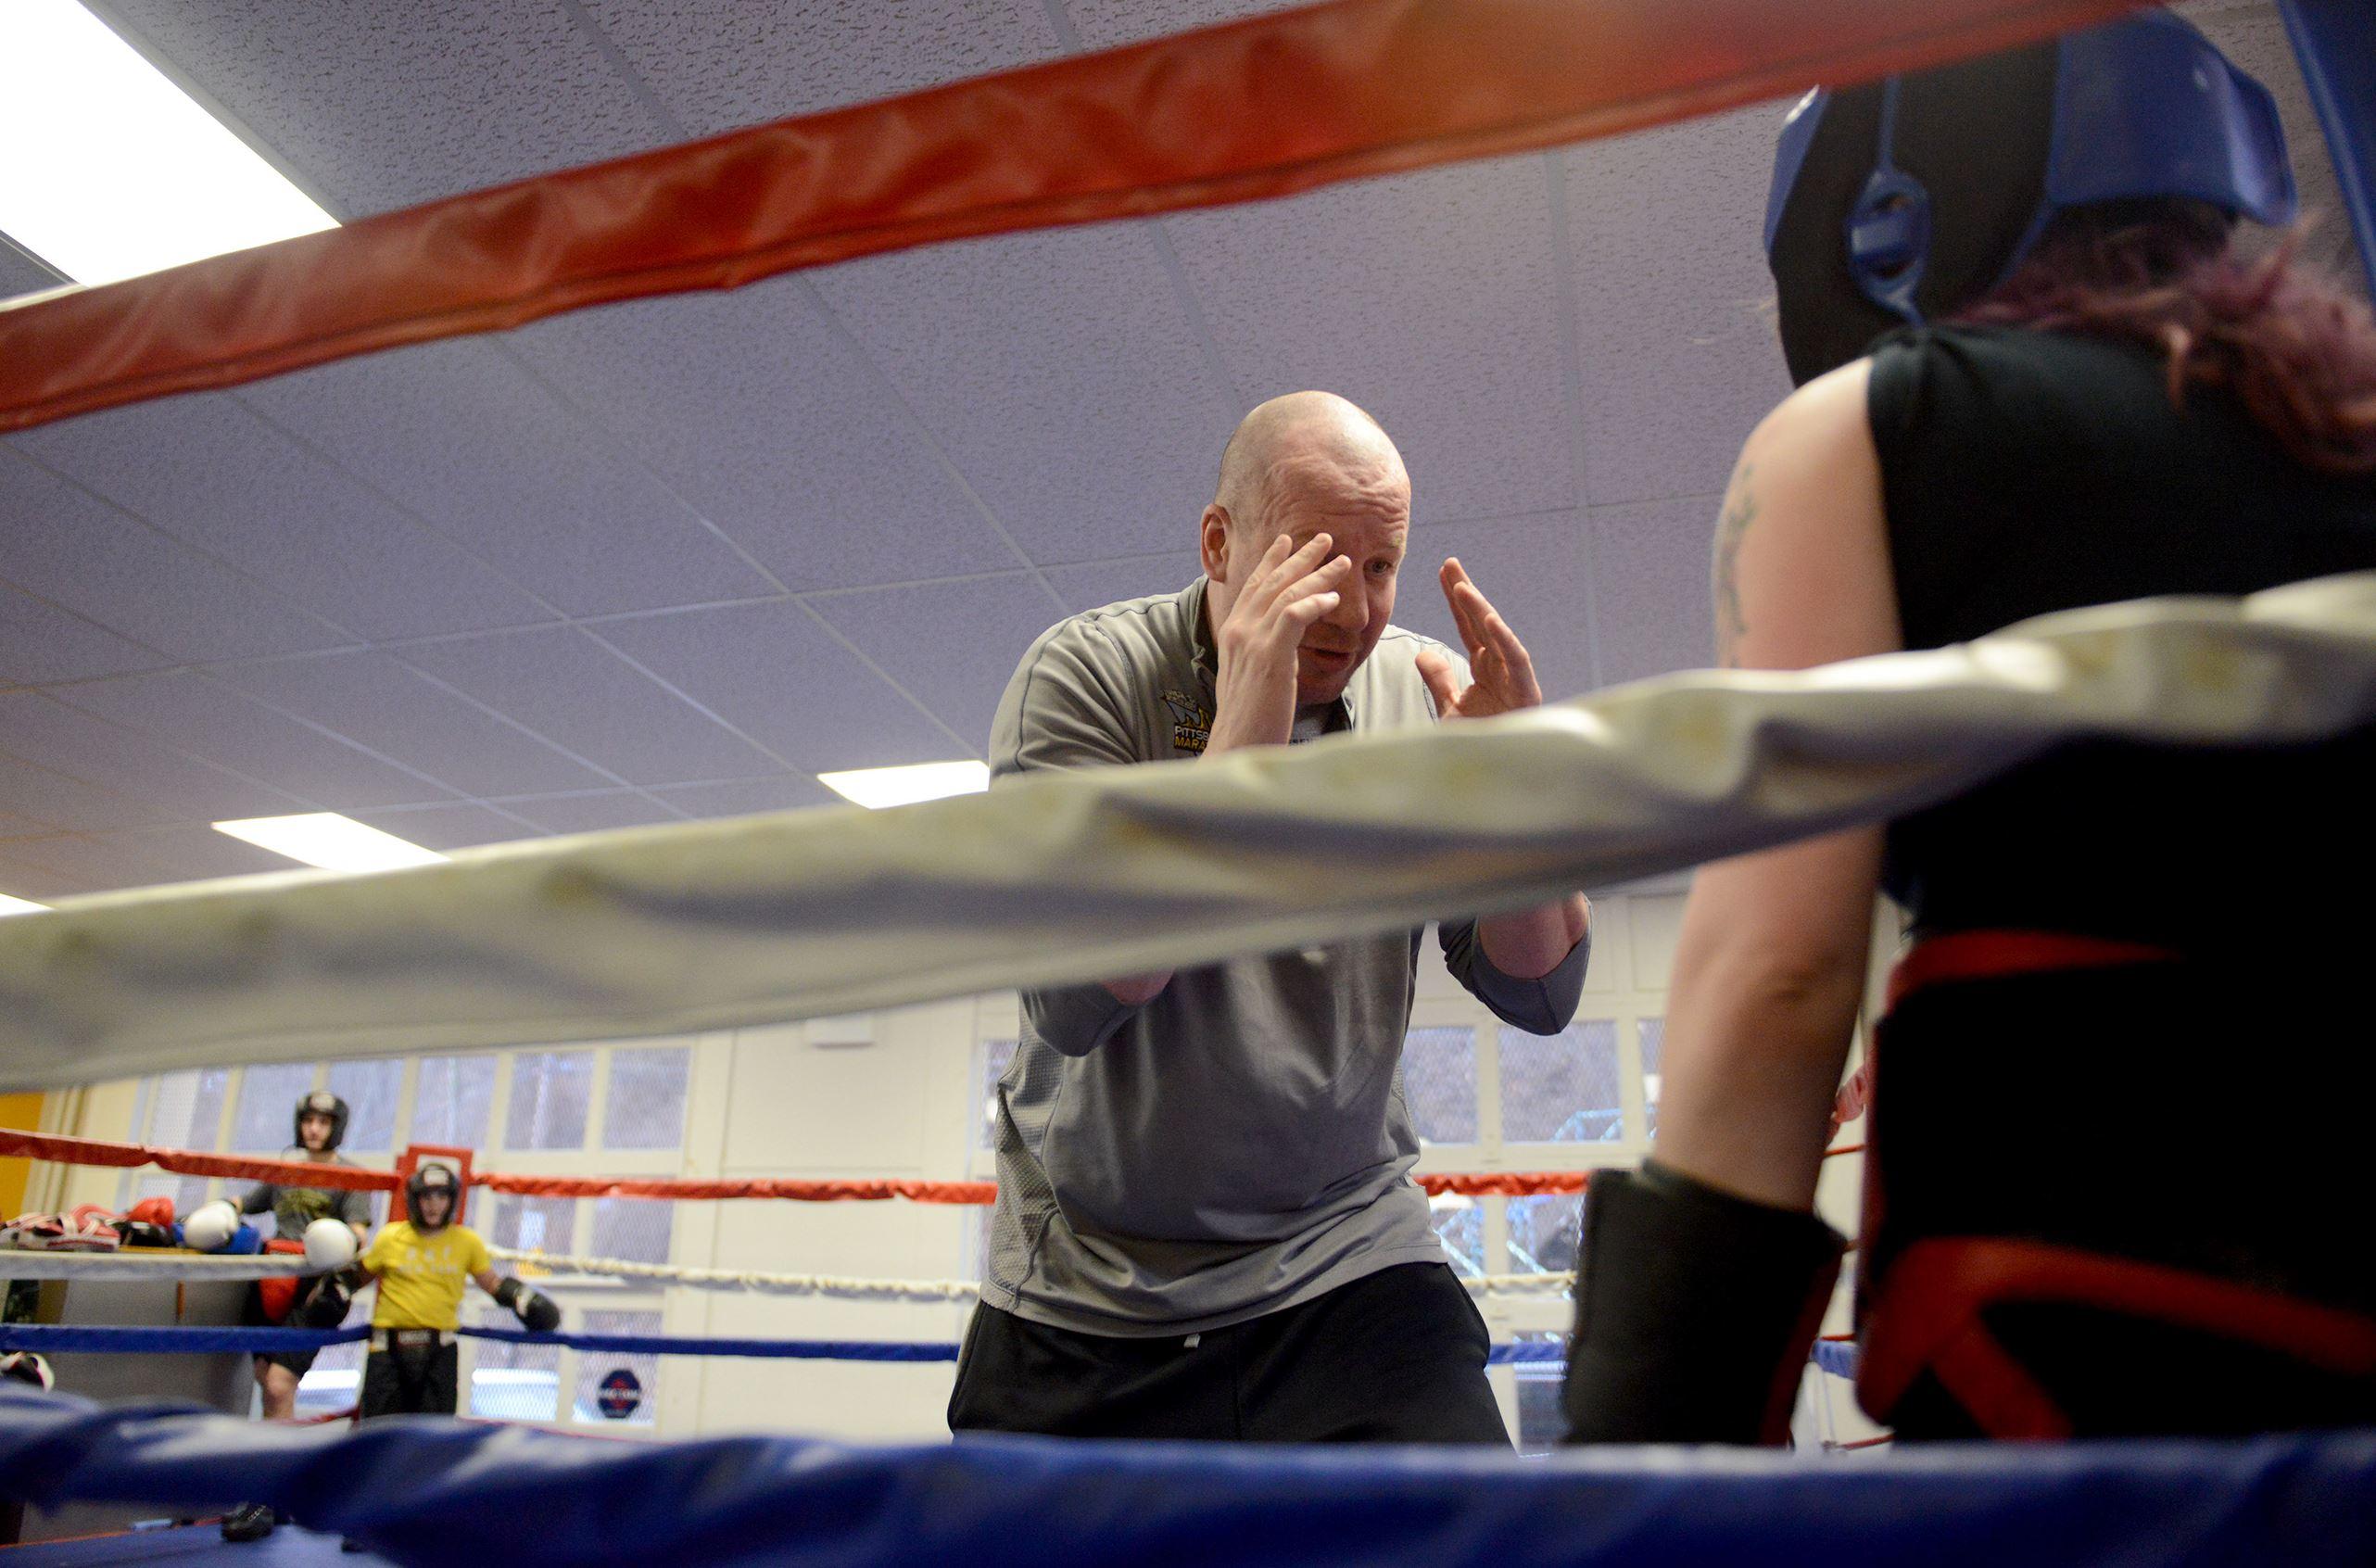 Jacks Boxing Gym